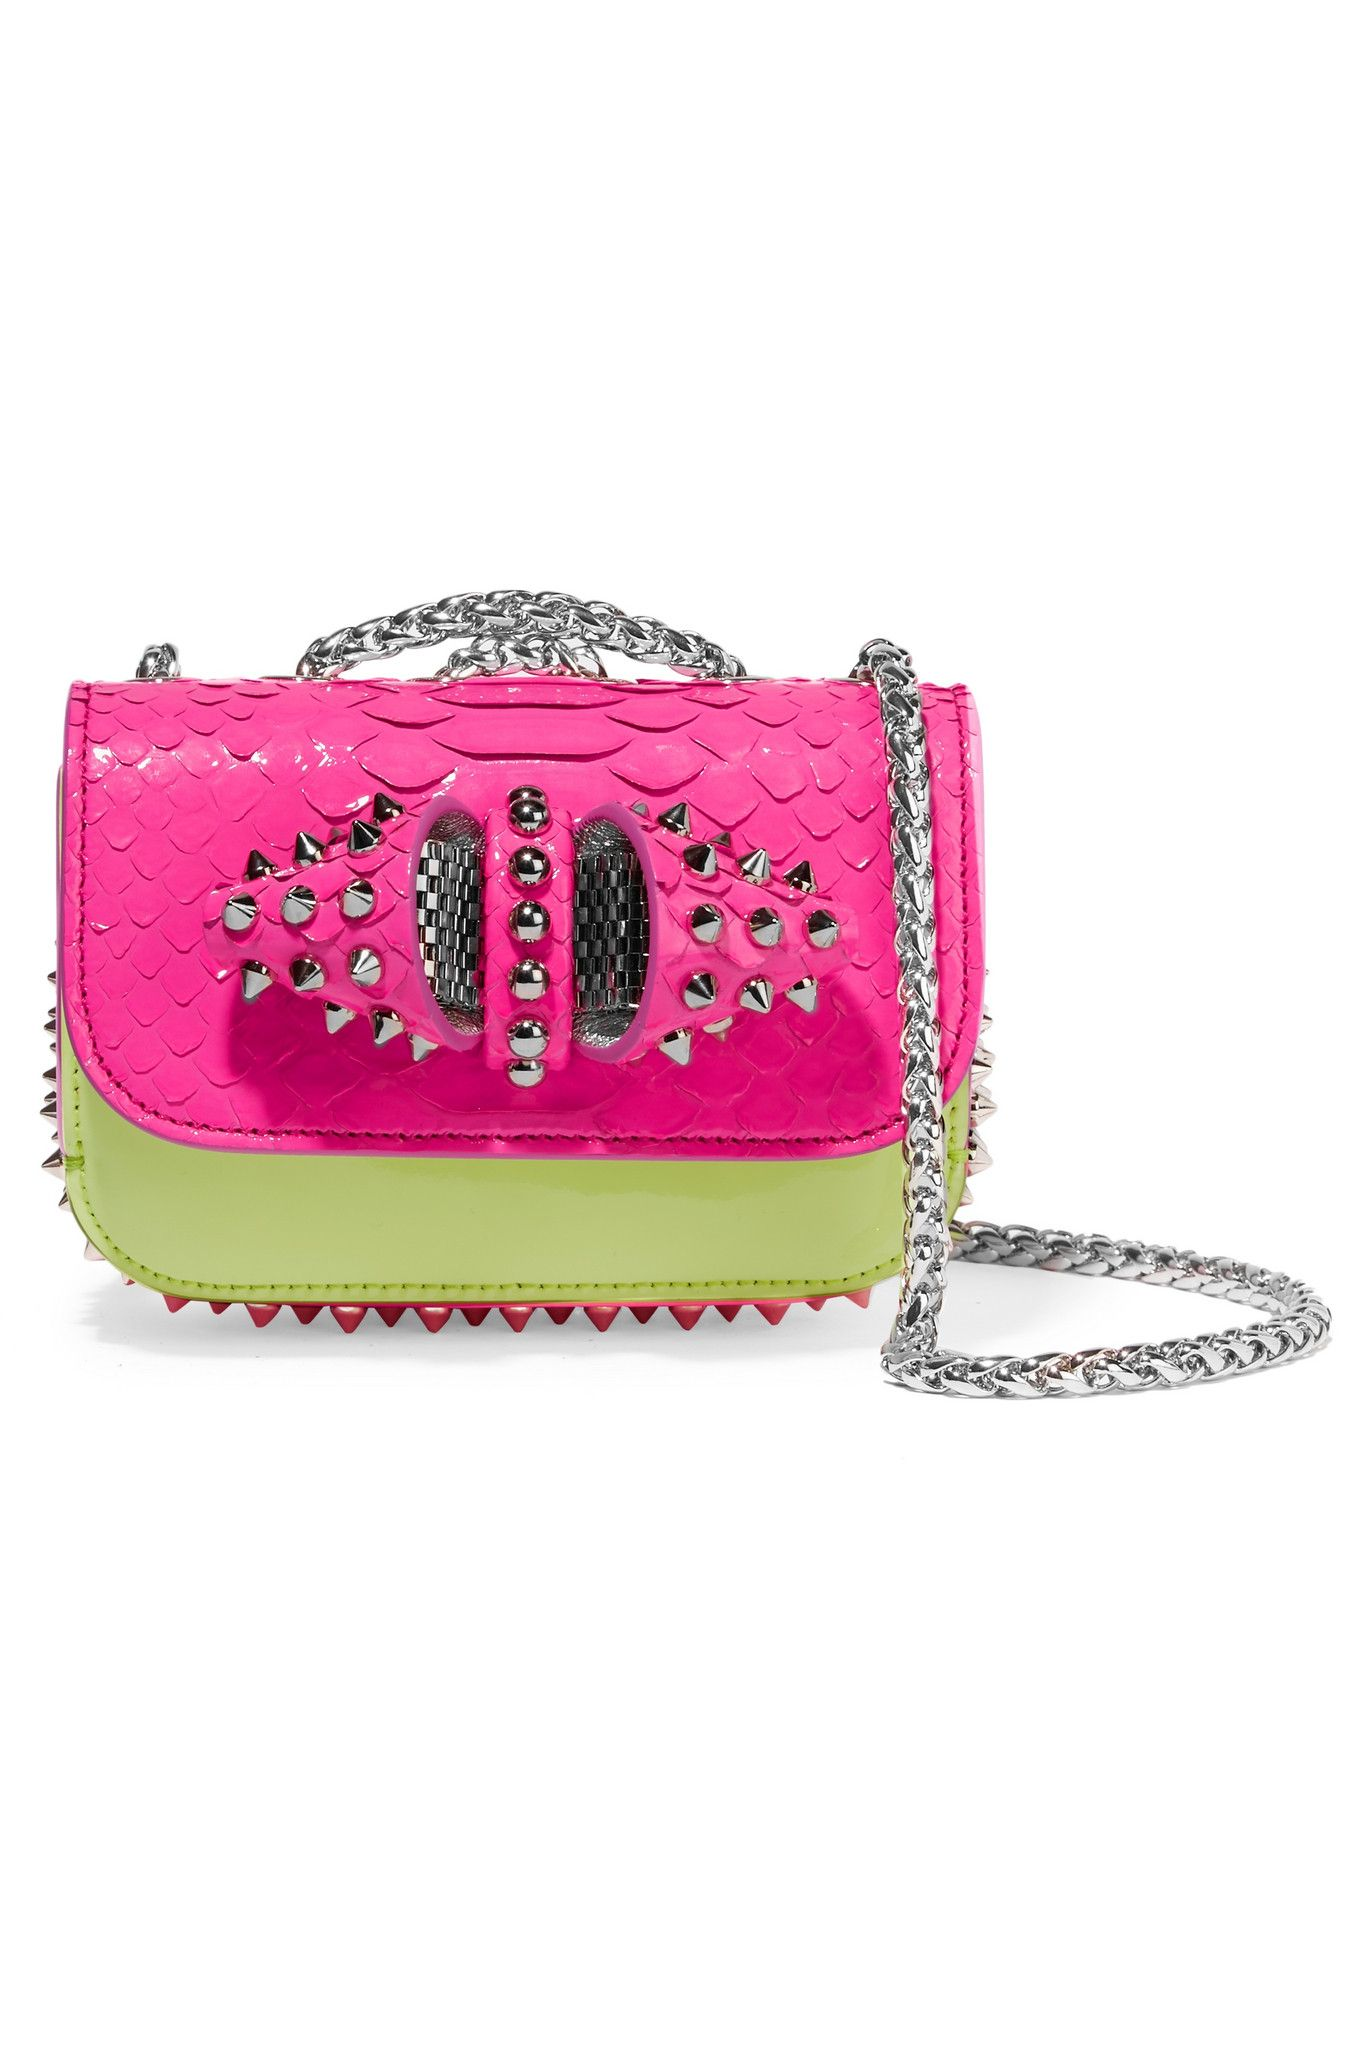 397e33b1e01 Women's Sweet Charity Mini Python And Leather Shoulder Bag ...